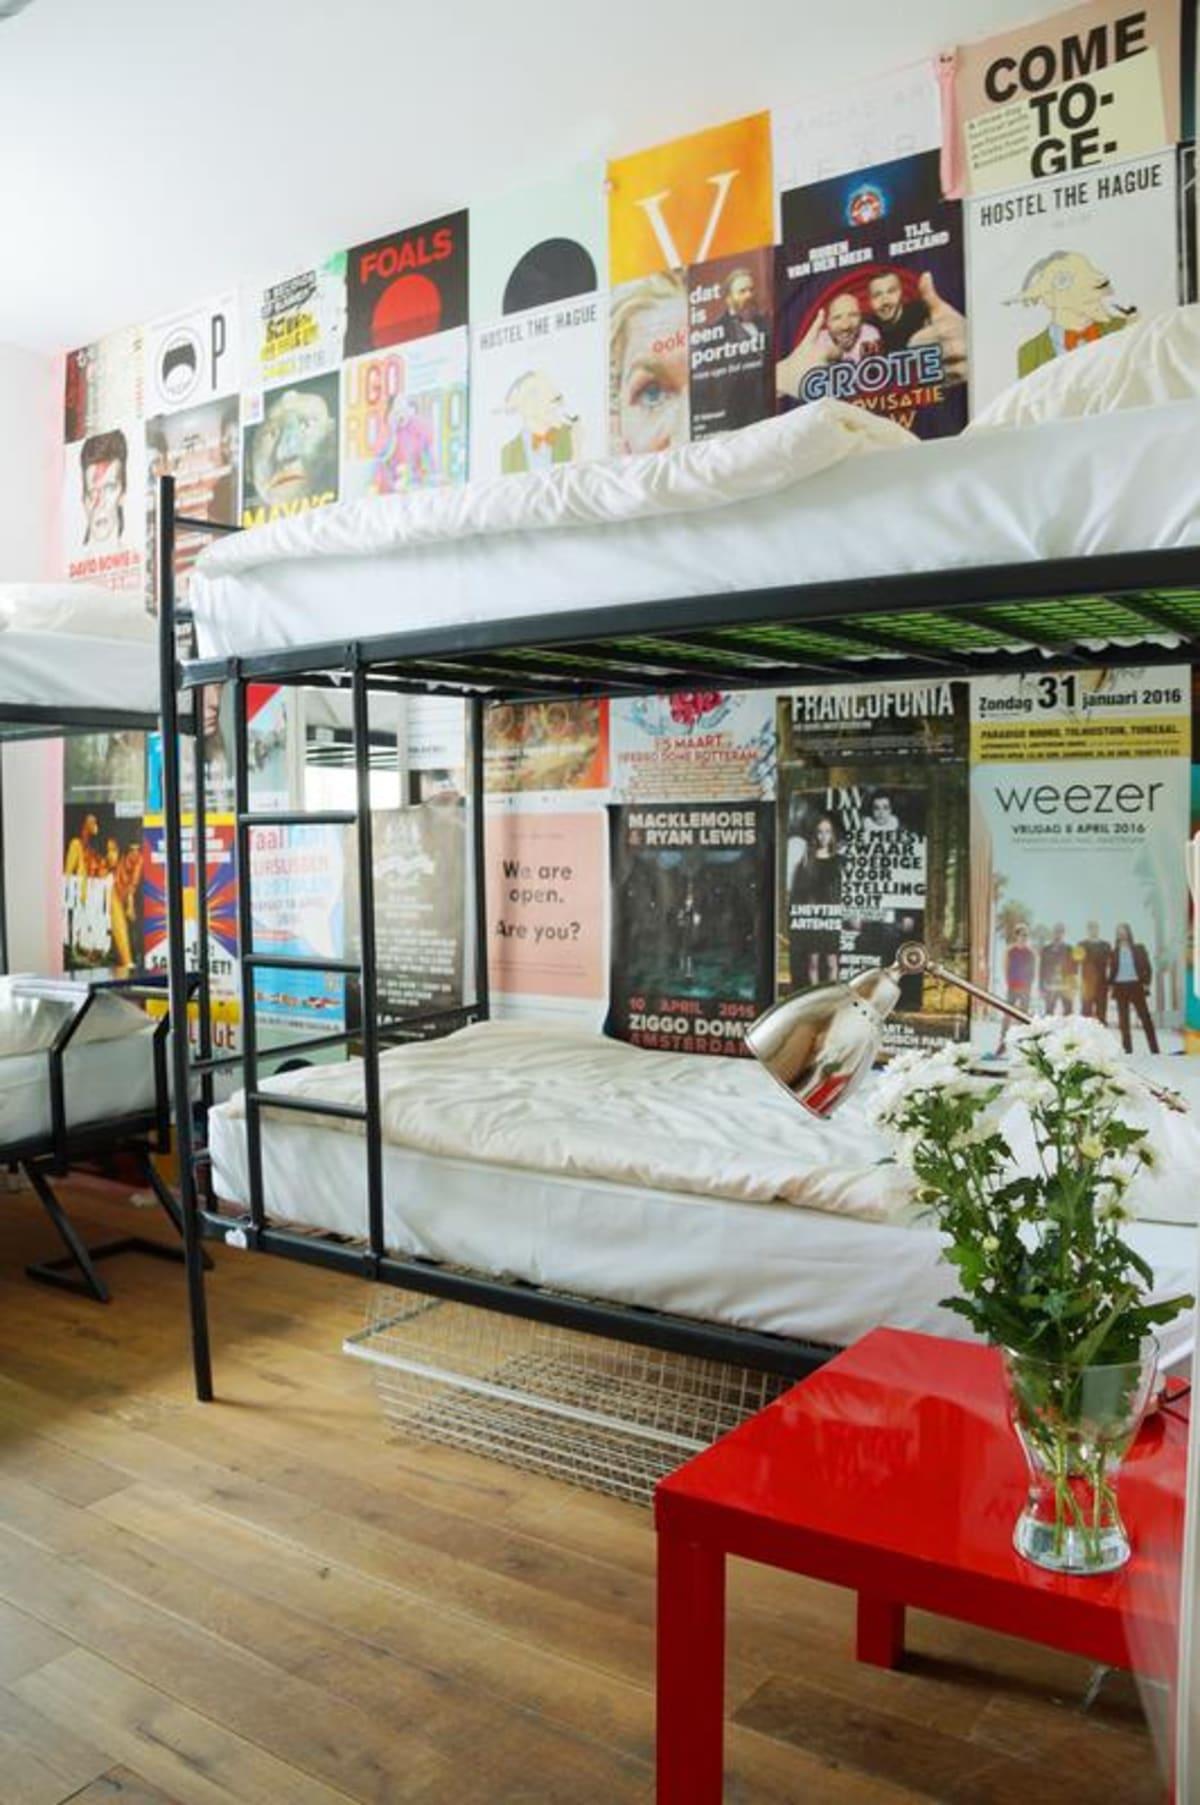 Hostel The Hague, Netherlands hostel